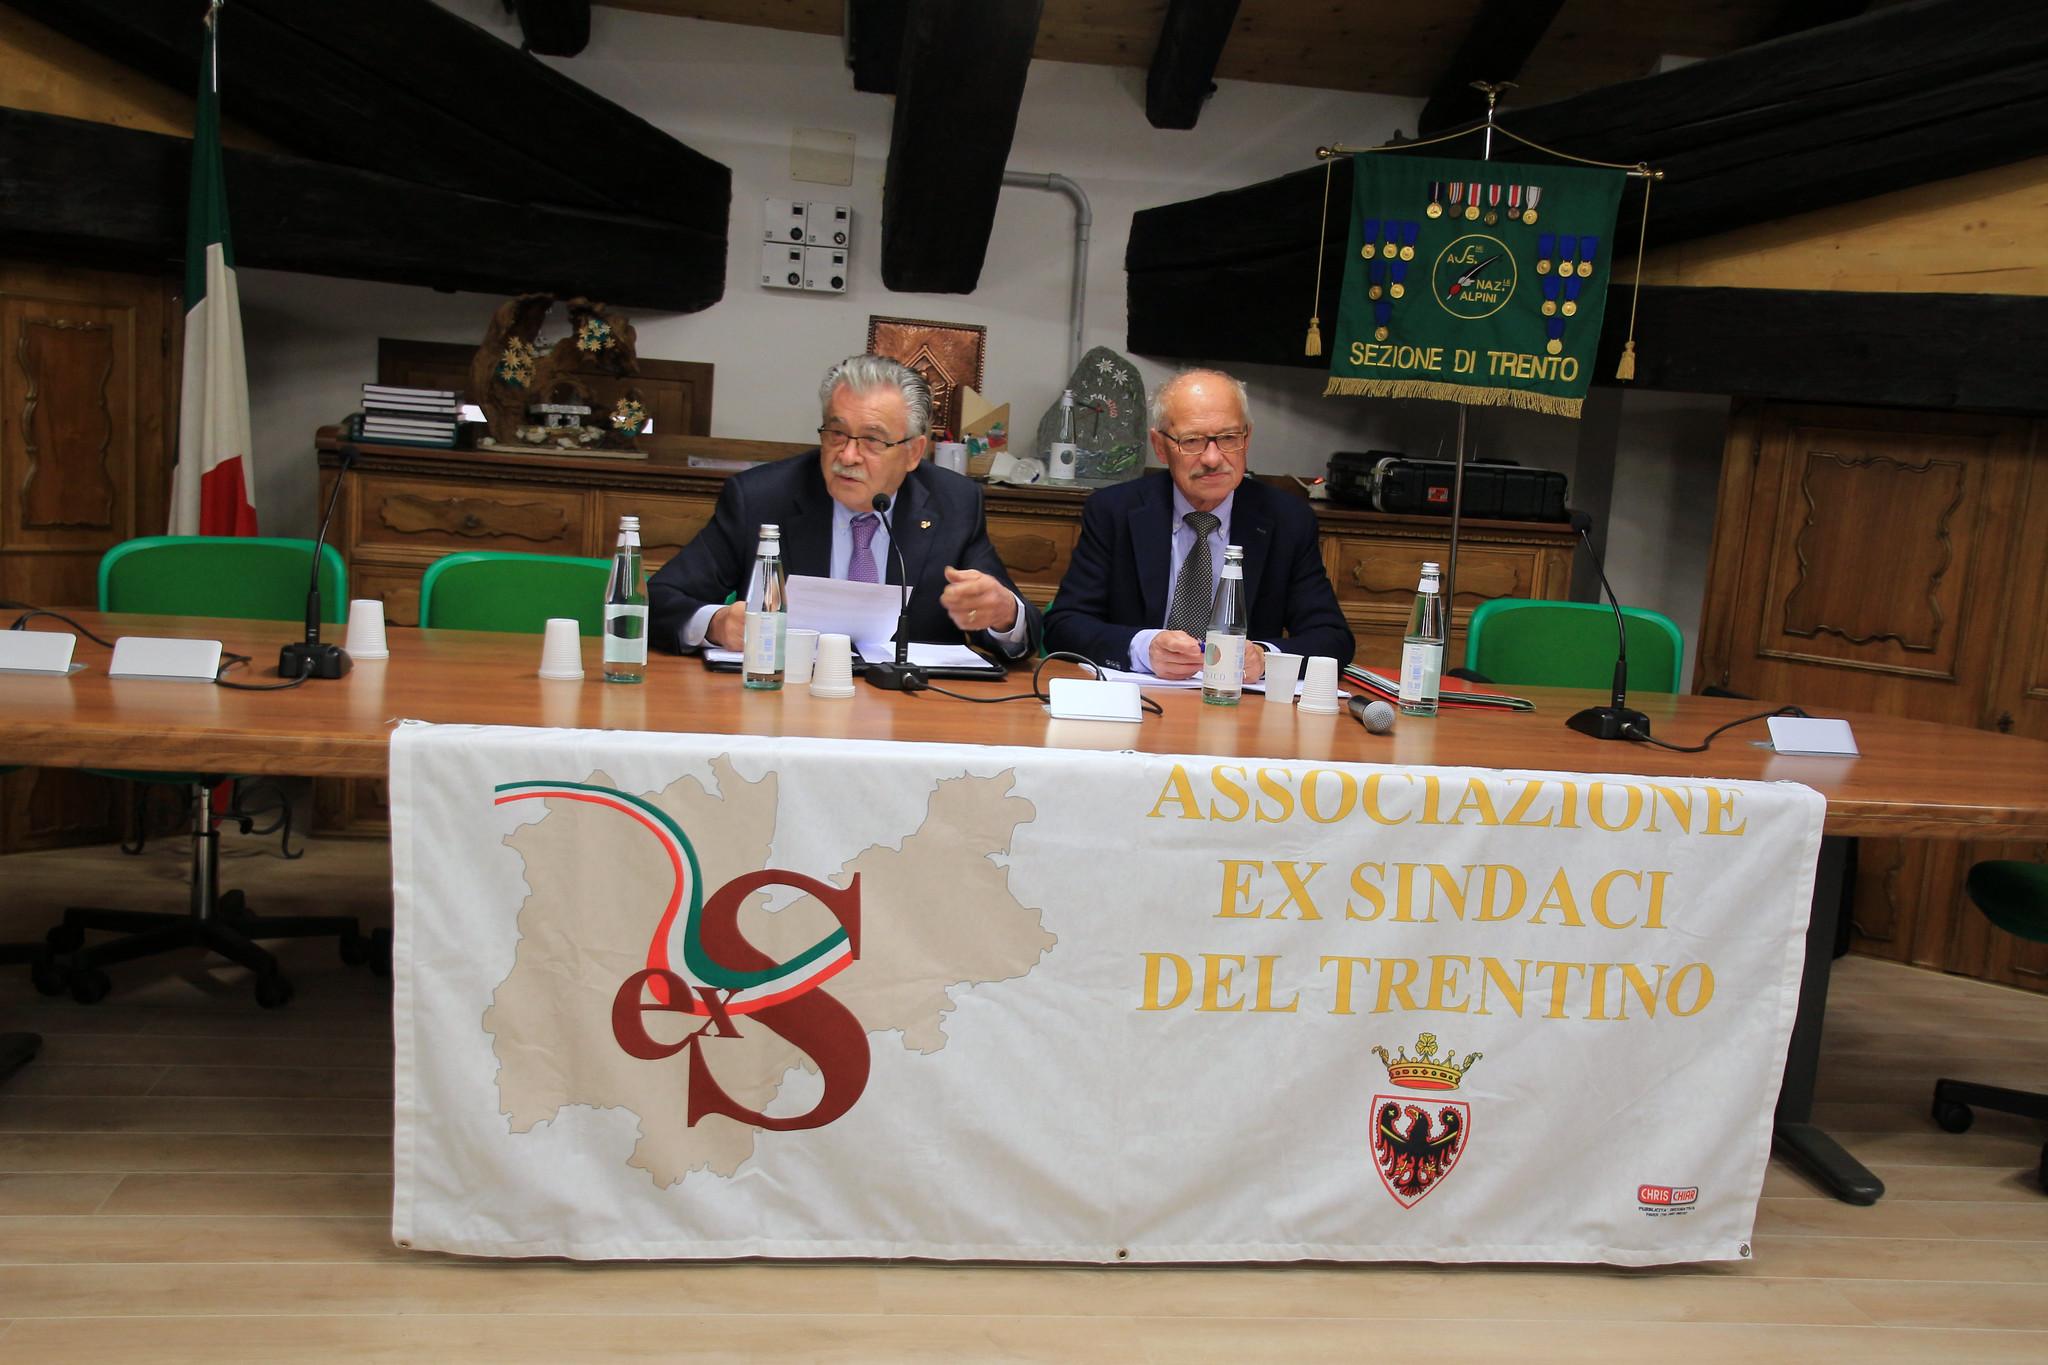 2019 - Assemblea c/o Alpini Trento